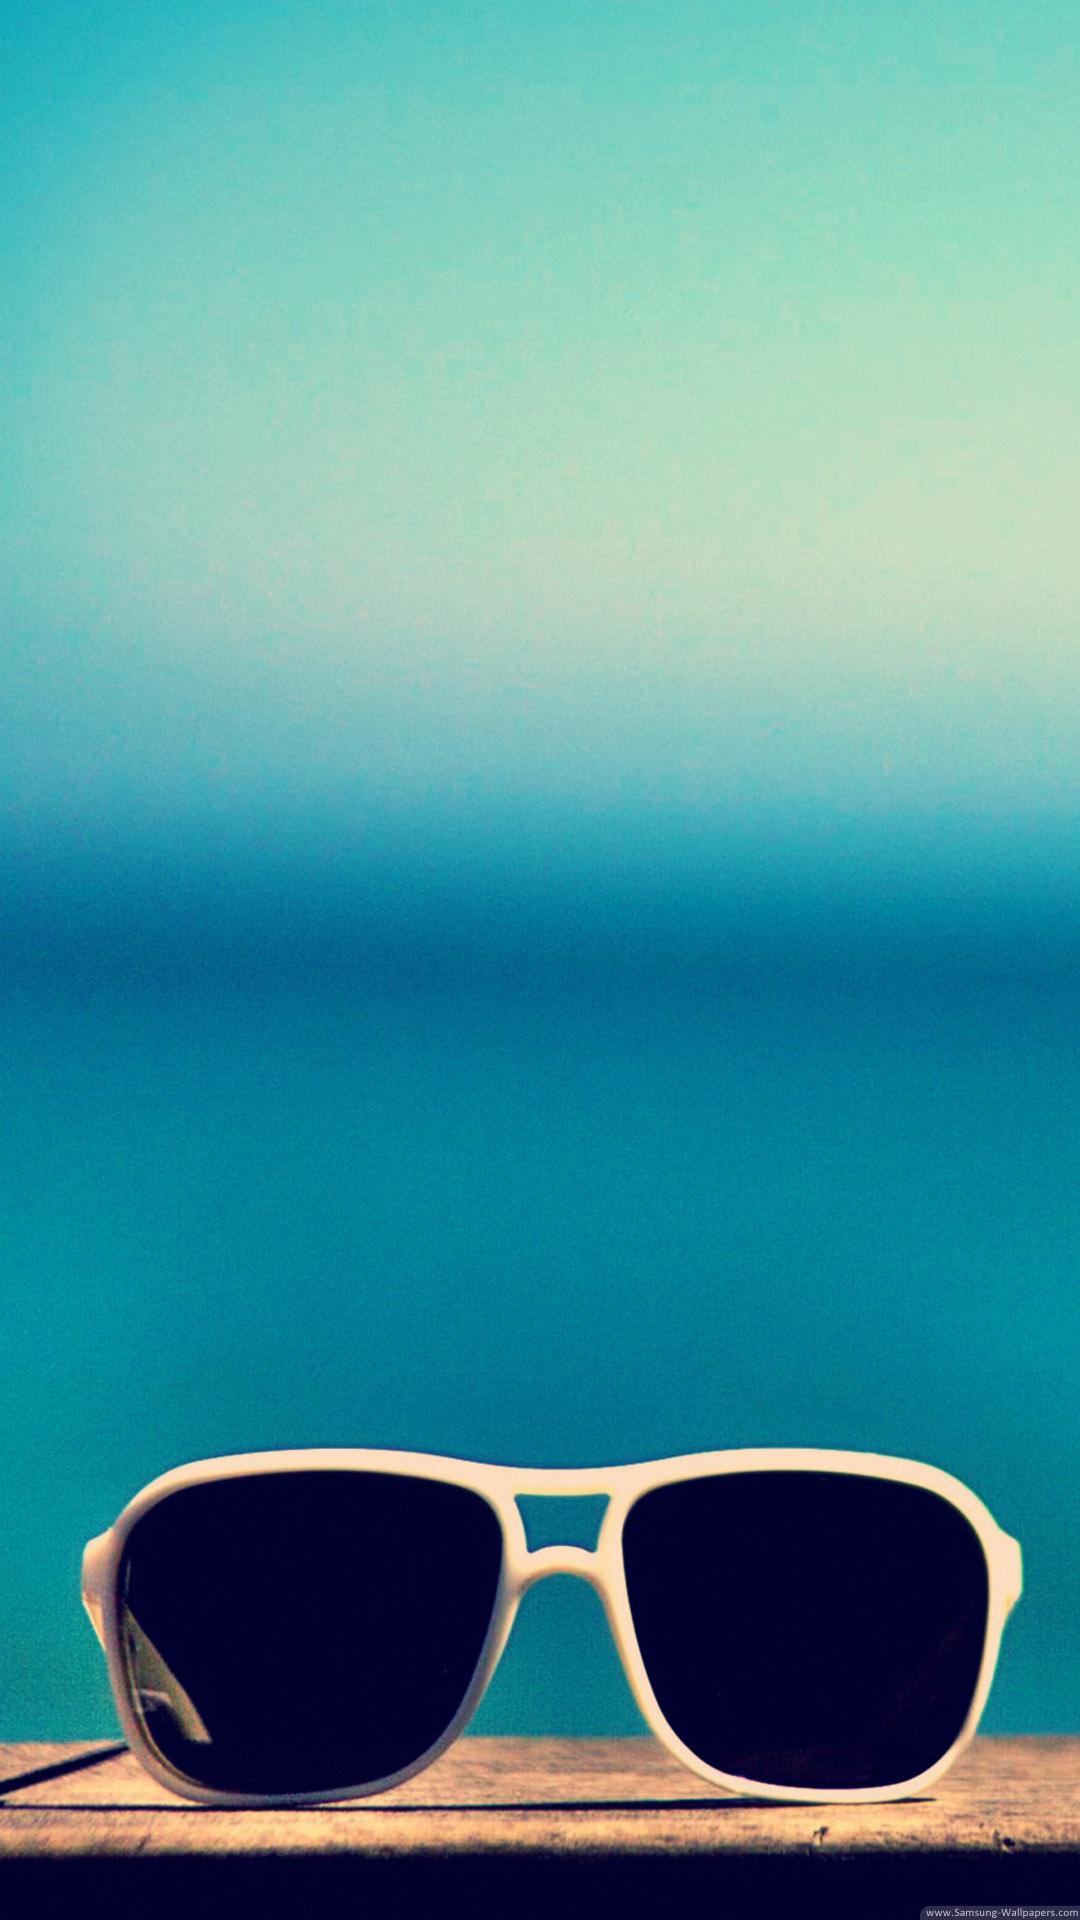 50 Cool Iphone Wallpapers Hd On Wallpapersafari